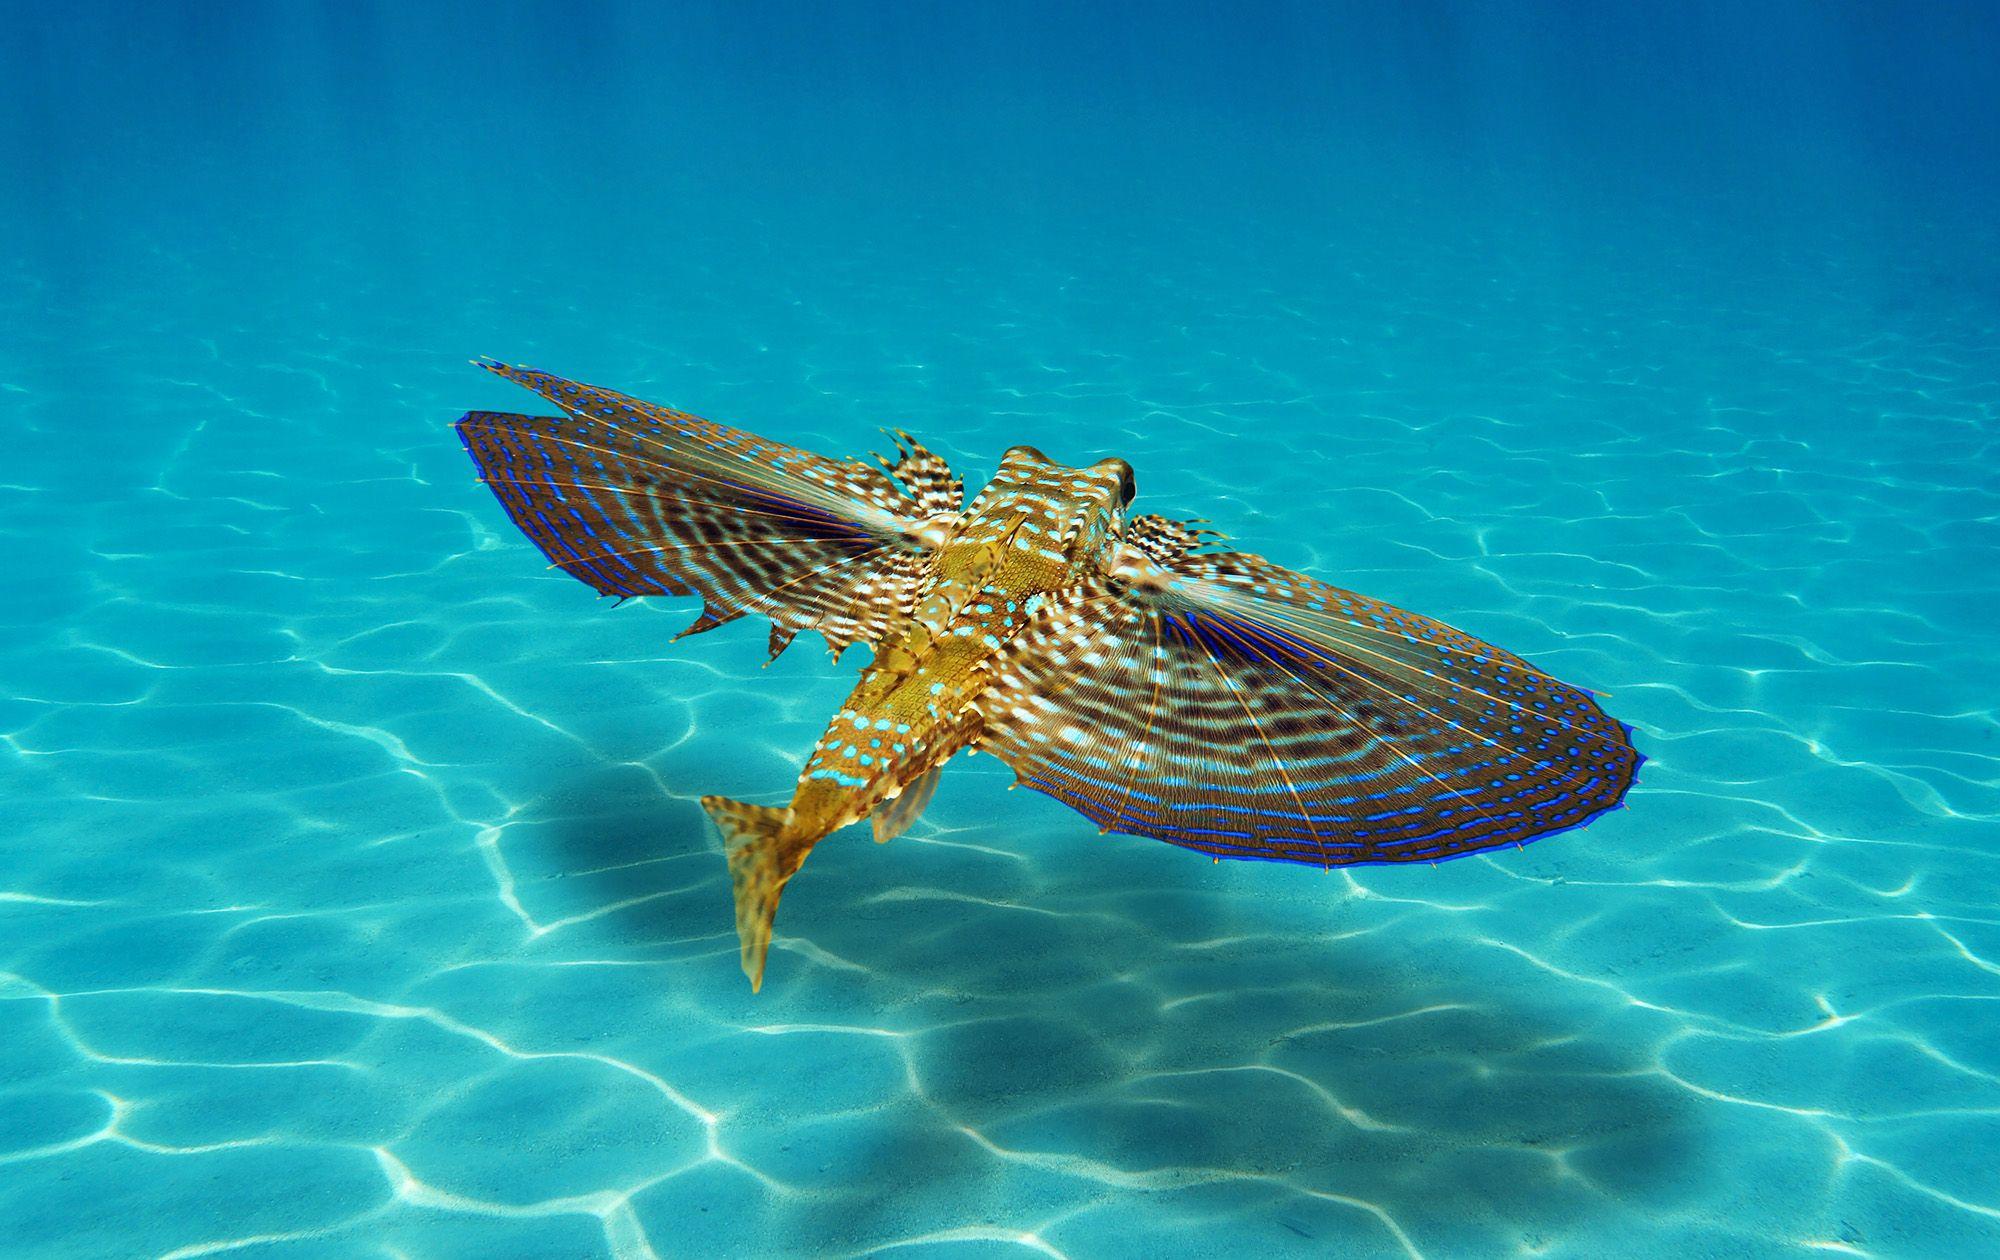 Flying Gurnard Scuba Dive